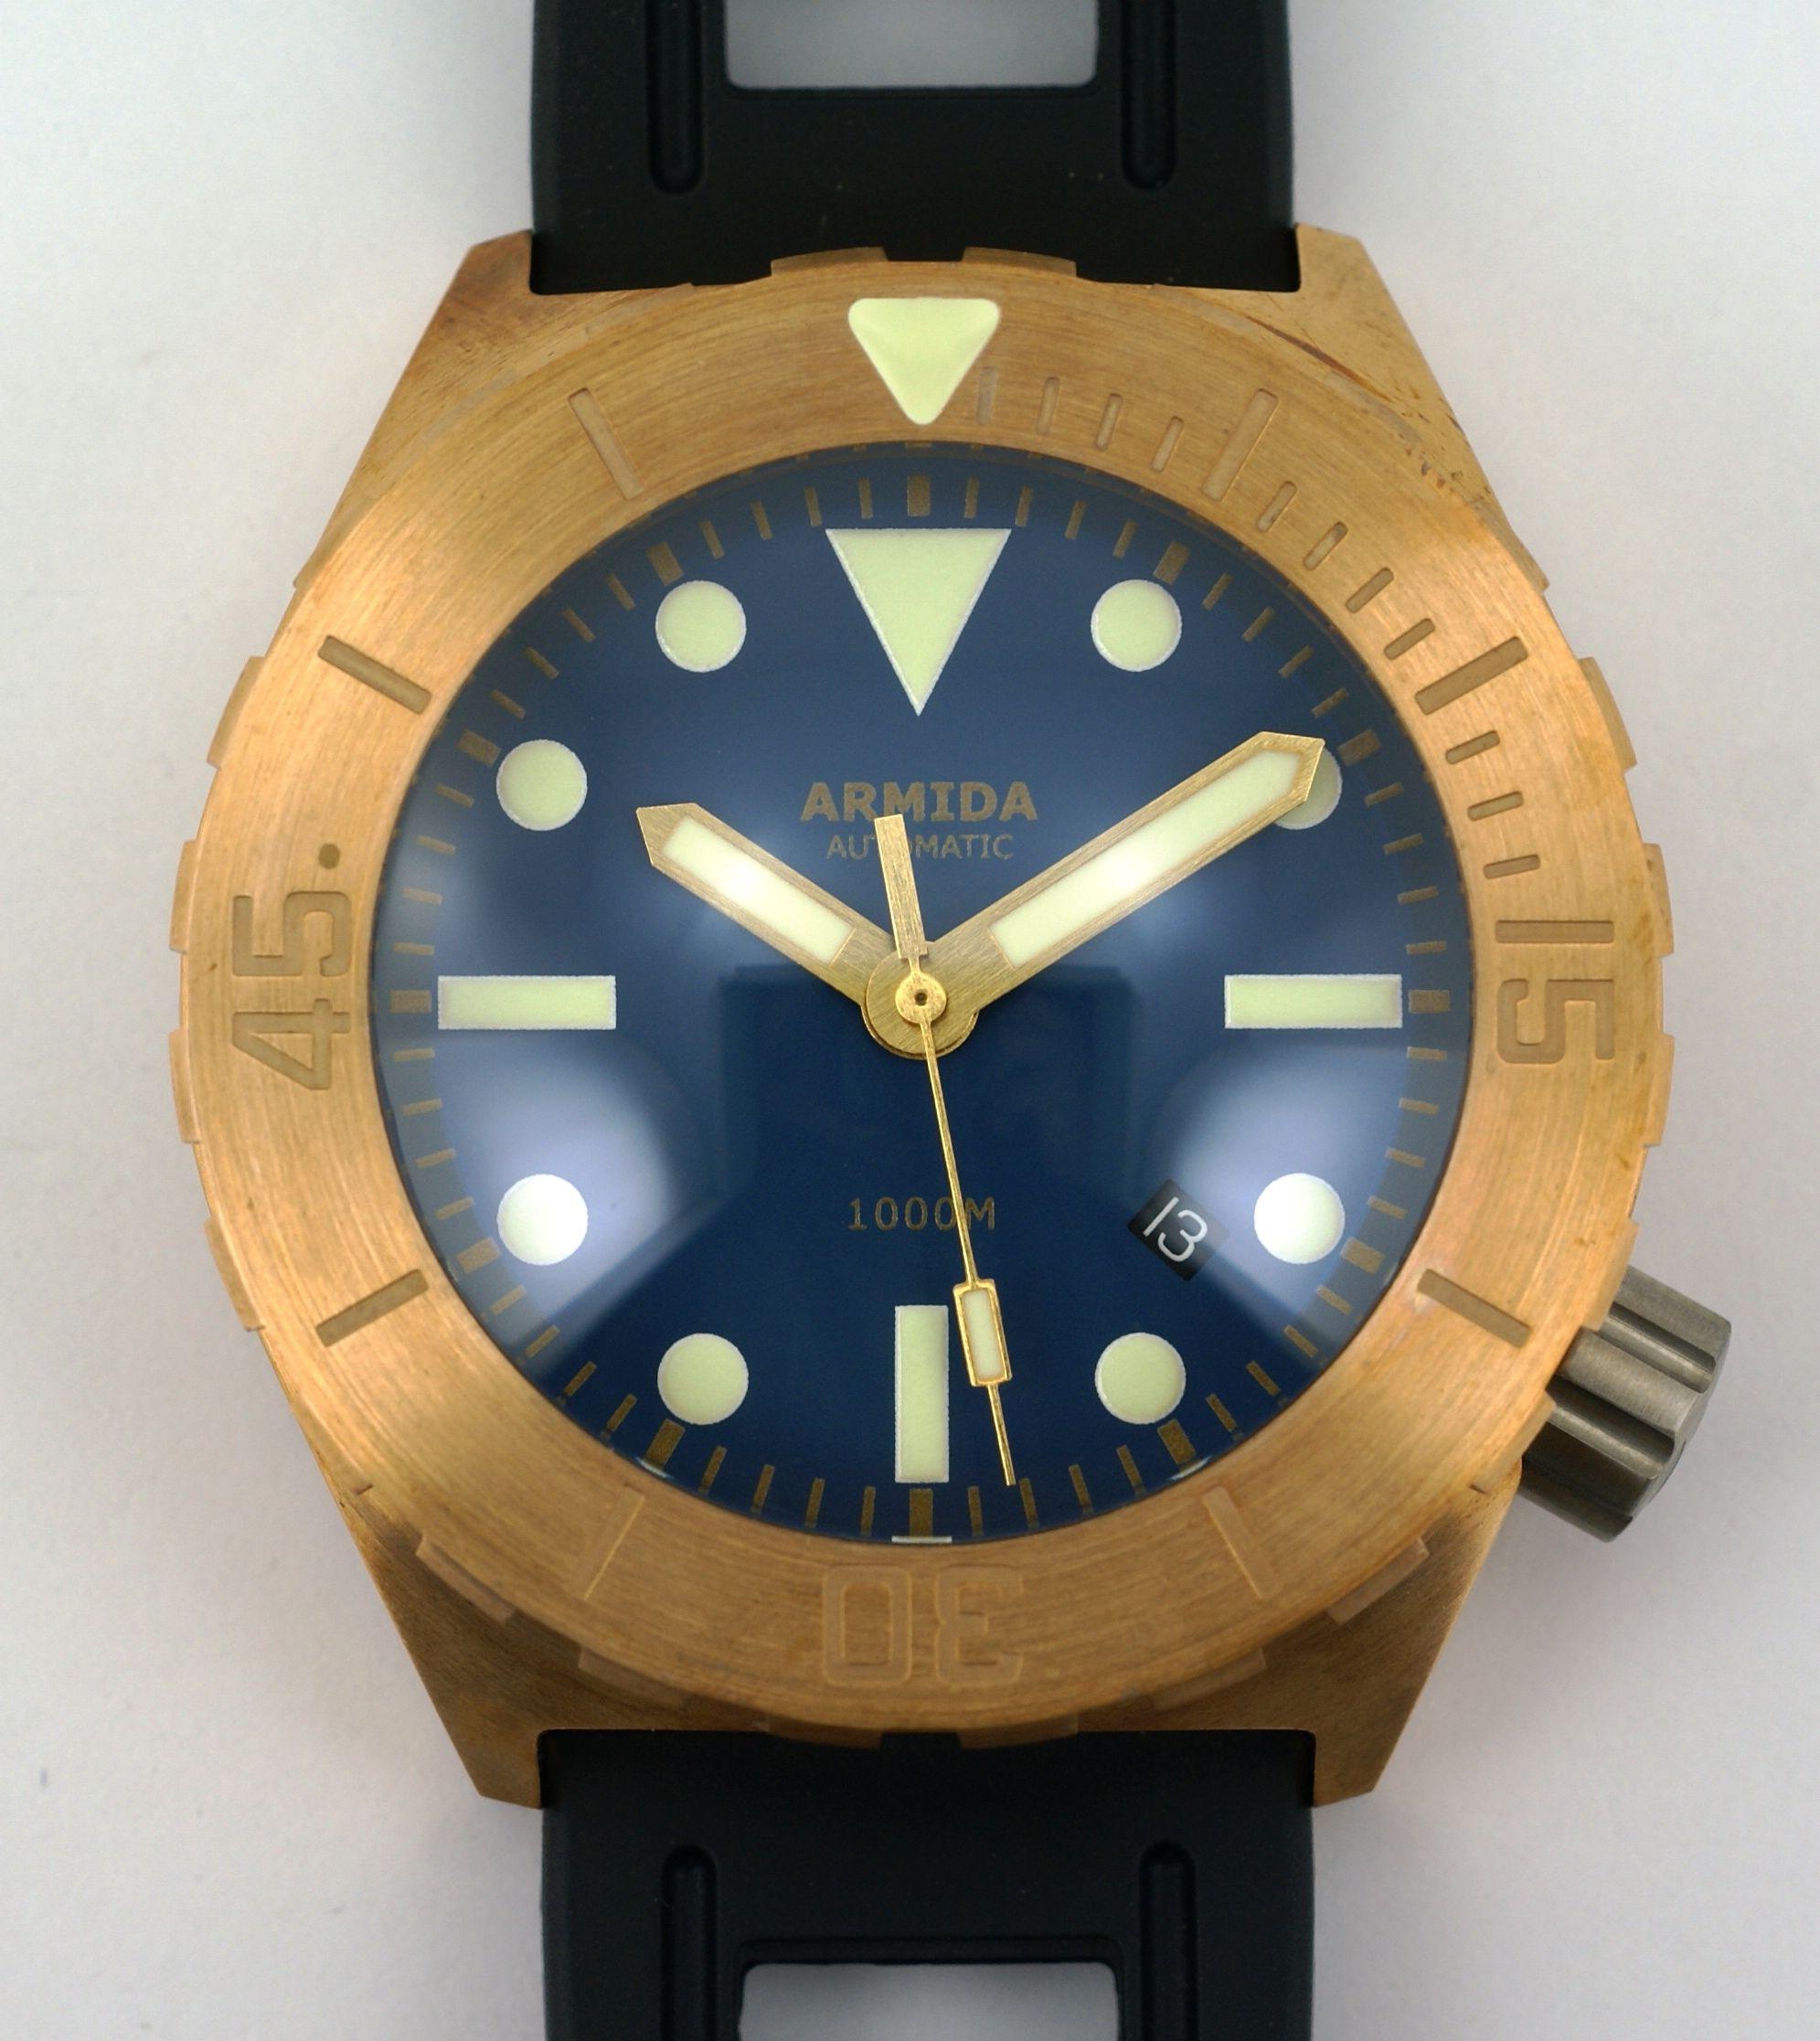 Stunning bronze watch ARMIDA WATCHES http://www.armidawatches.com/a1-1000m-bronze.php